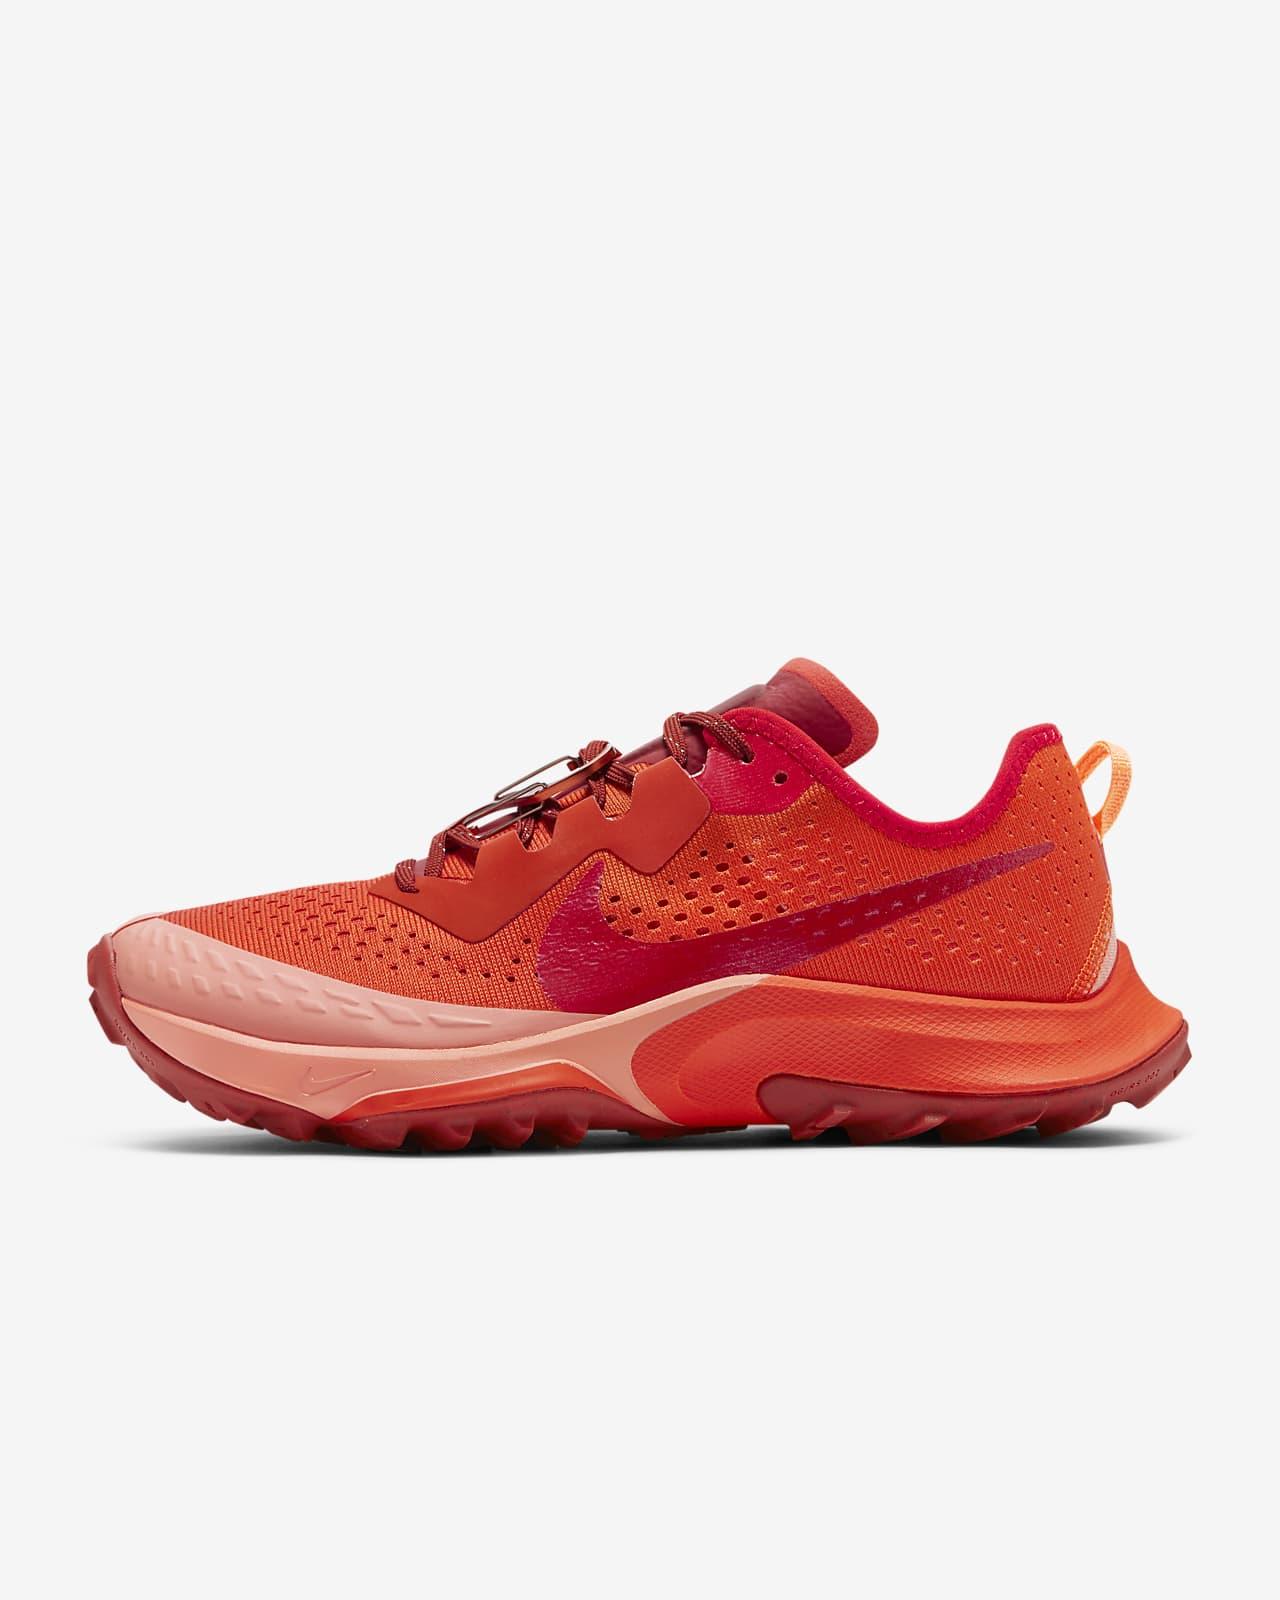 Chaussure de trail Nike Air Zoom Terra Kiger 7 pour Femme